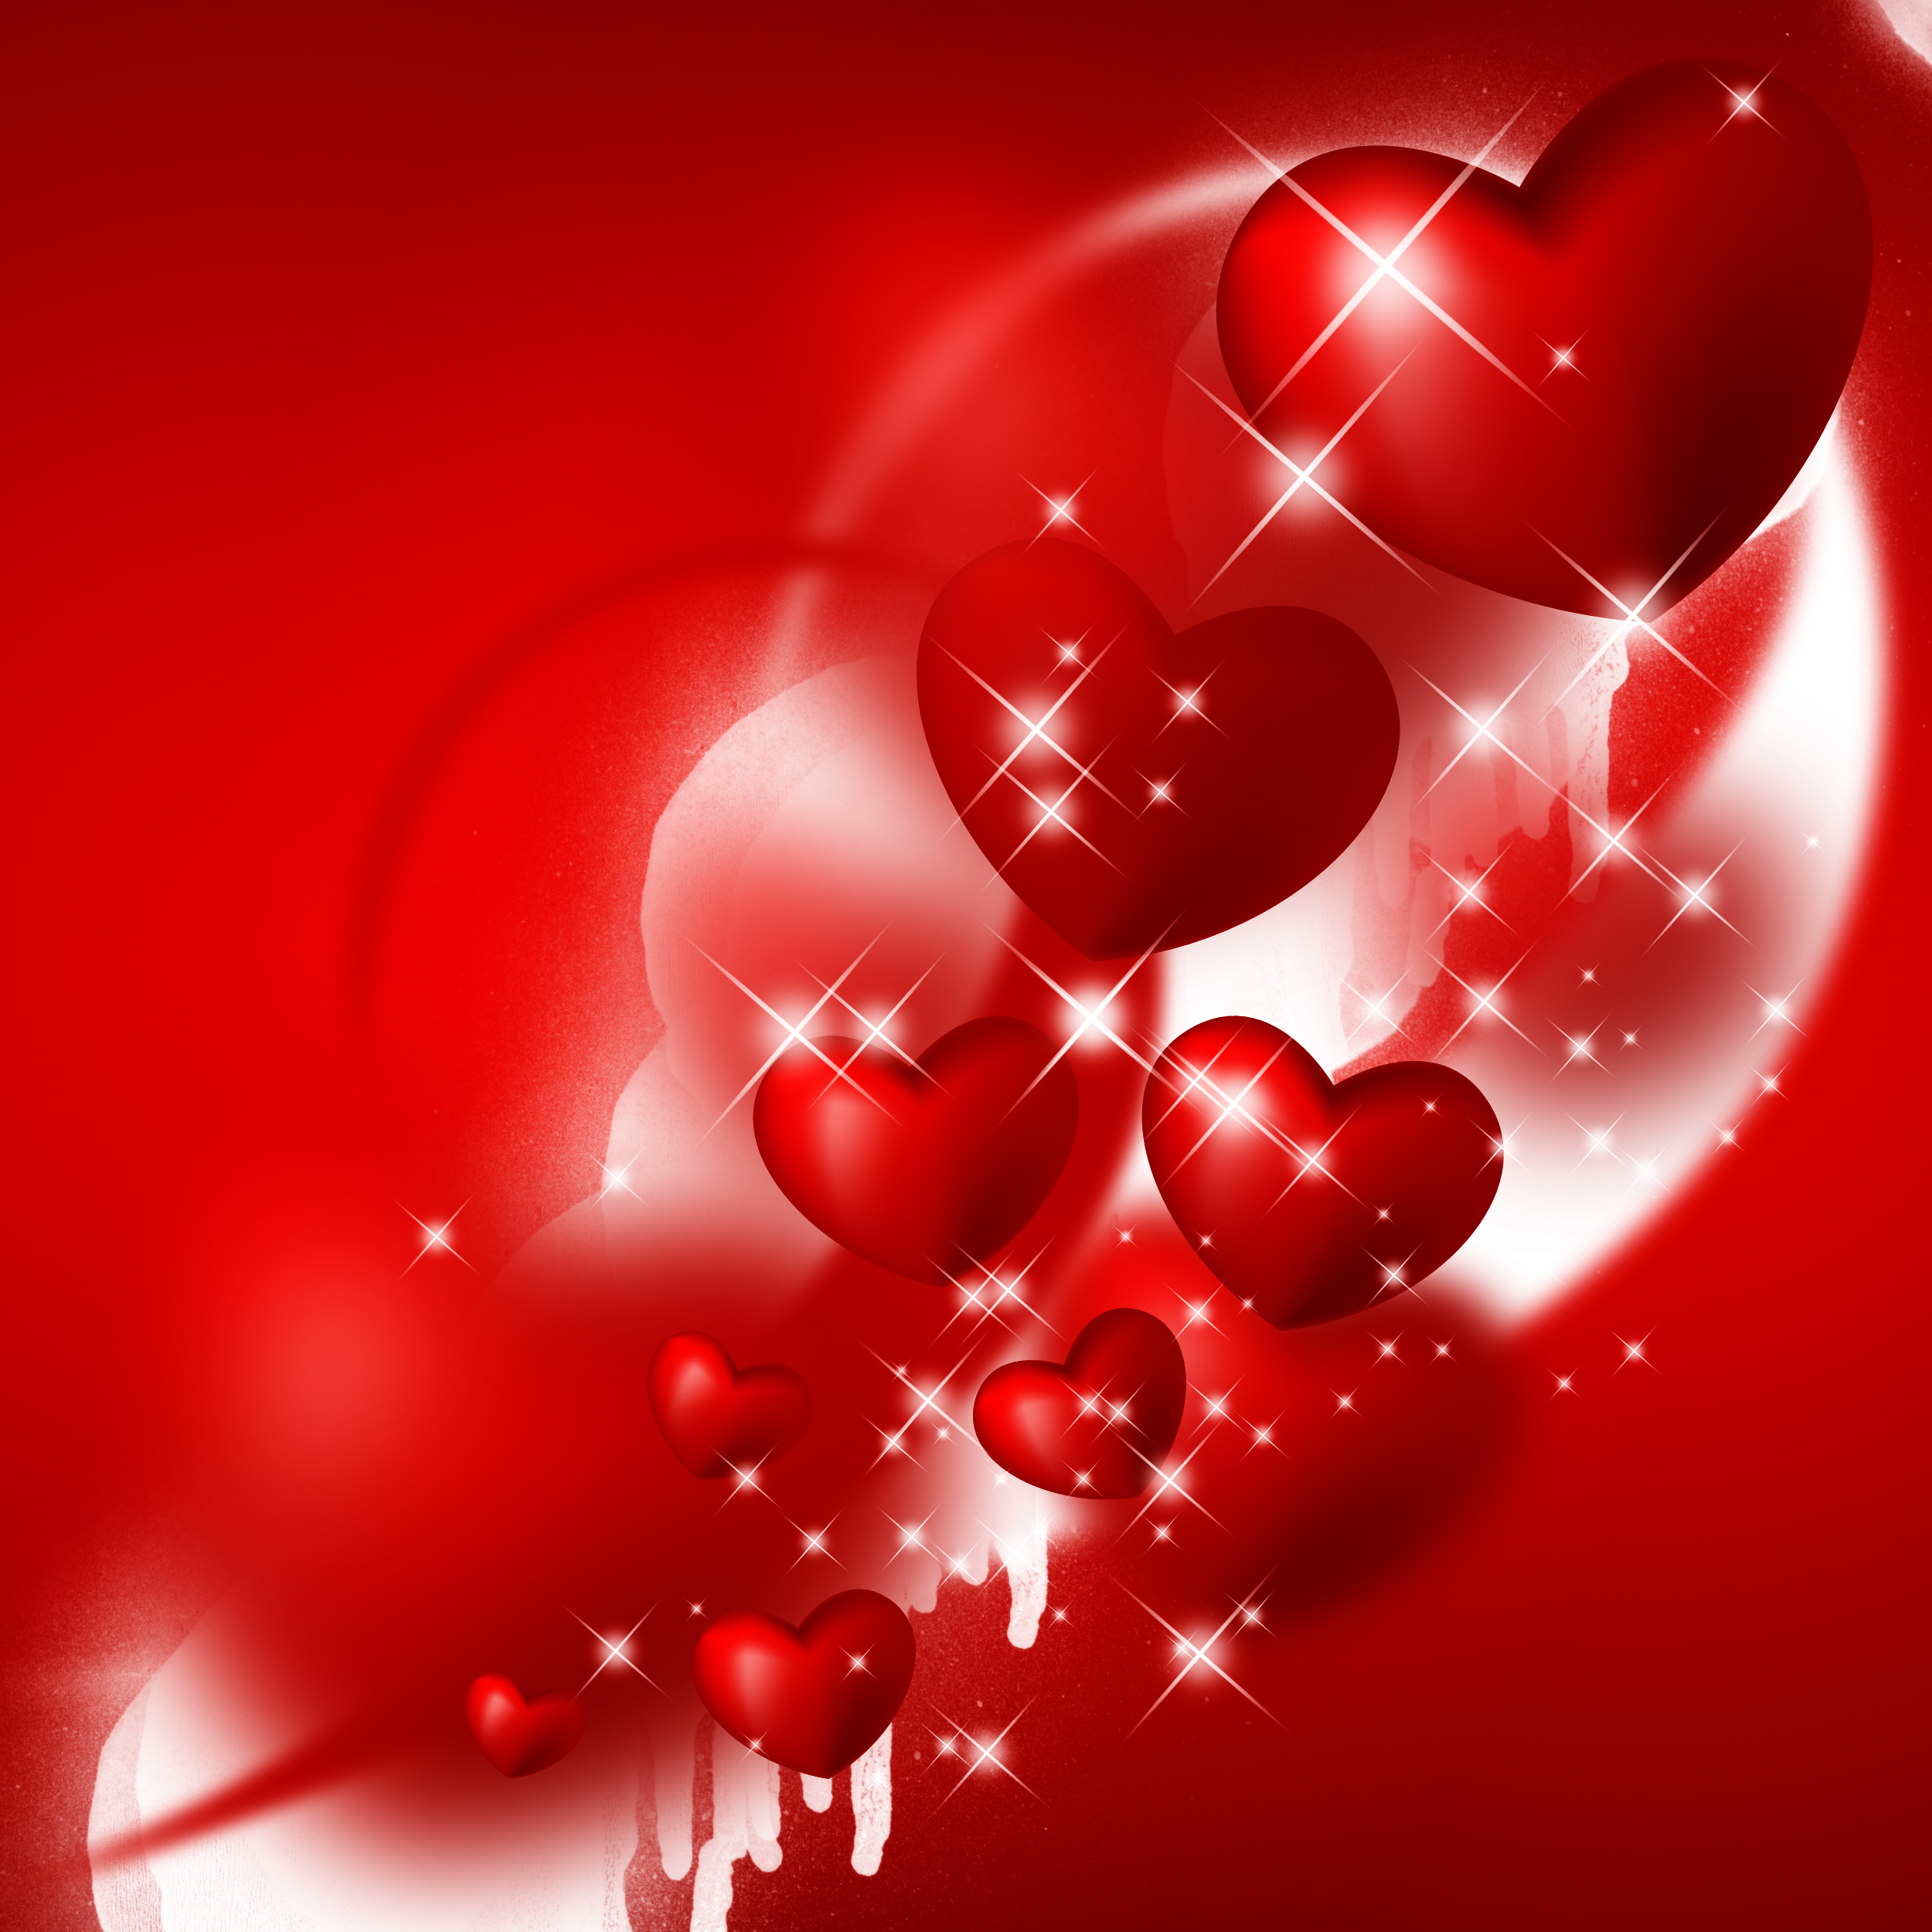 71 Valentine Backgrounds Free On Wallpapersafari